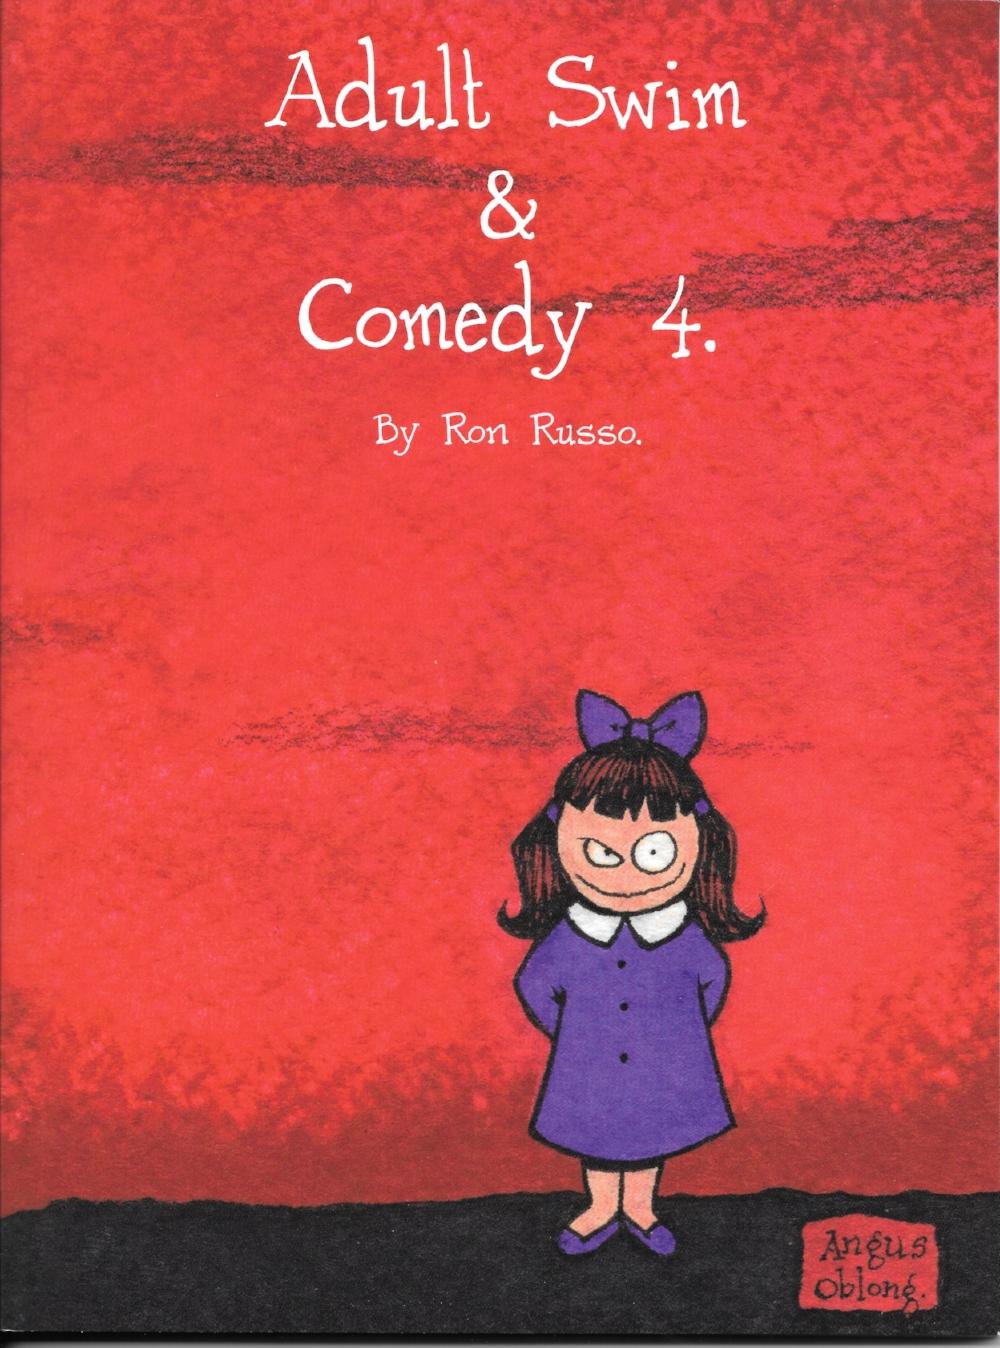 AdultSwim&Comedy4cover.jpeg